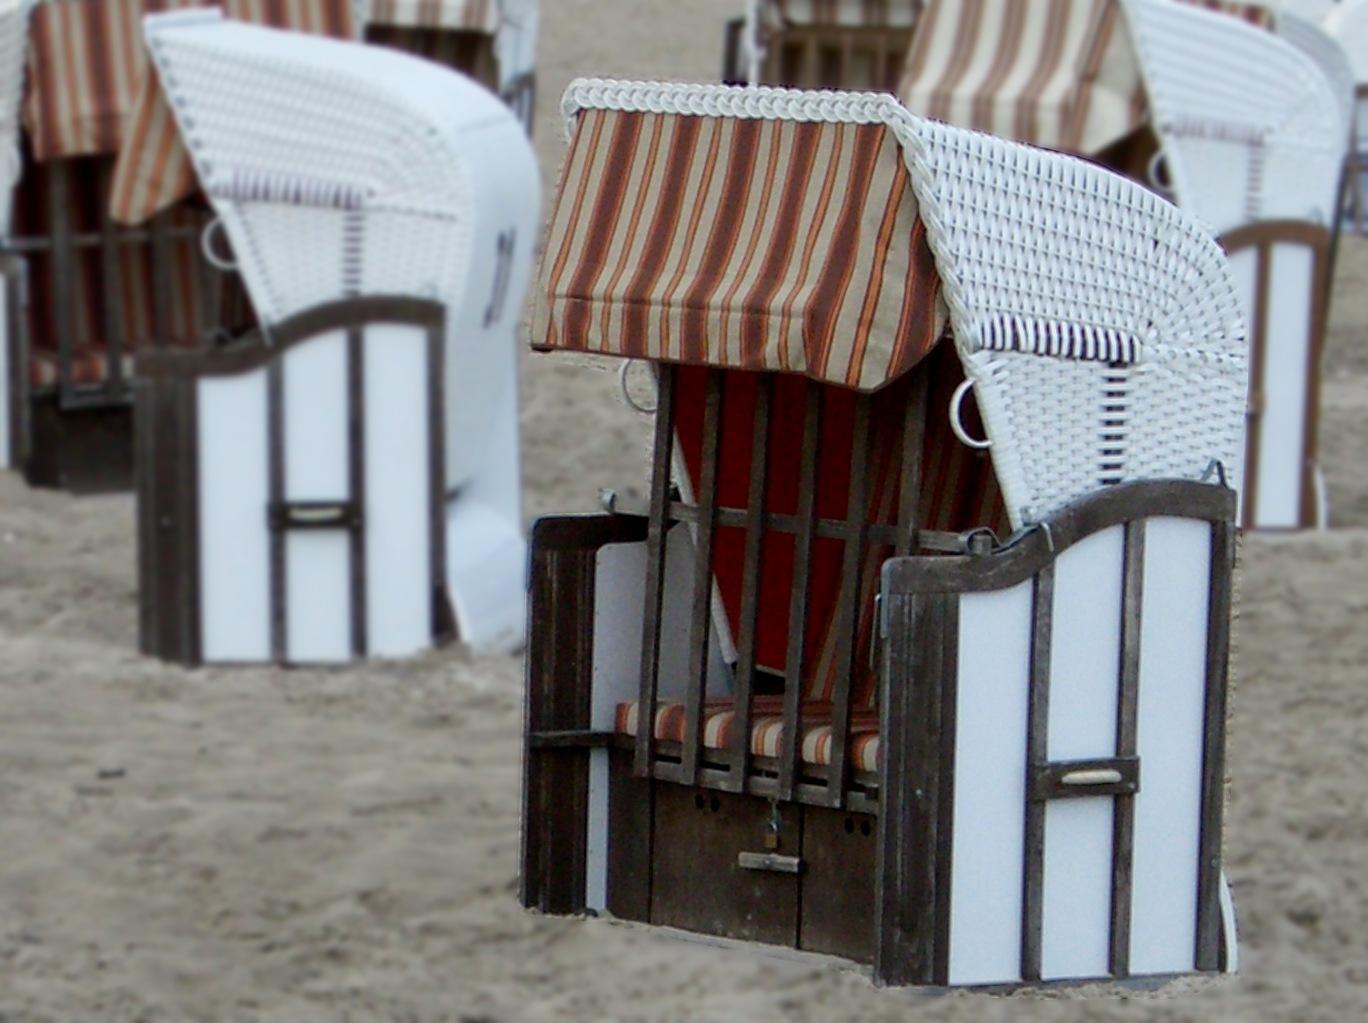 Beach memories by Barbara Bumm